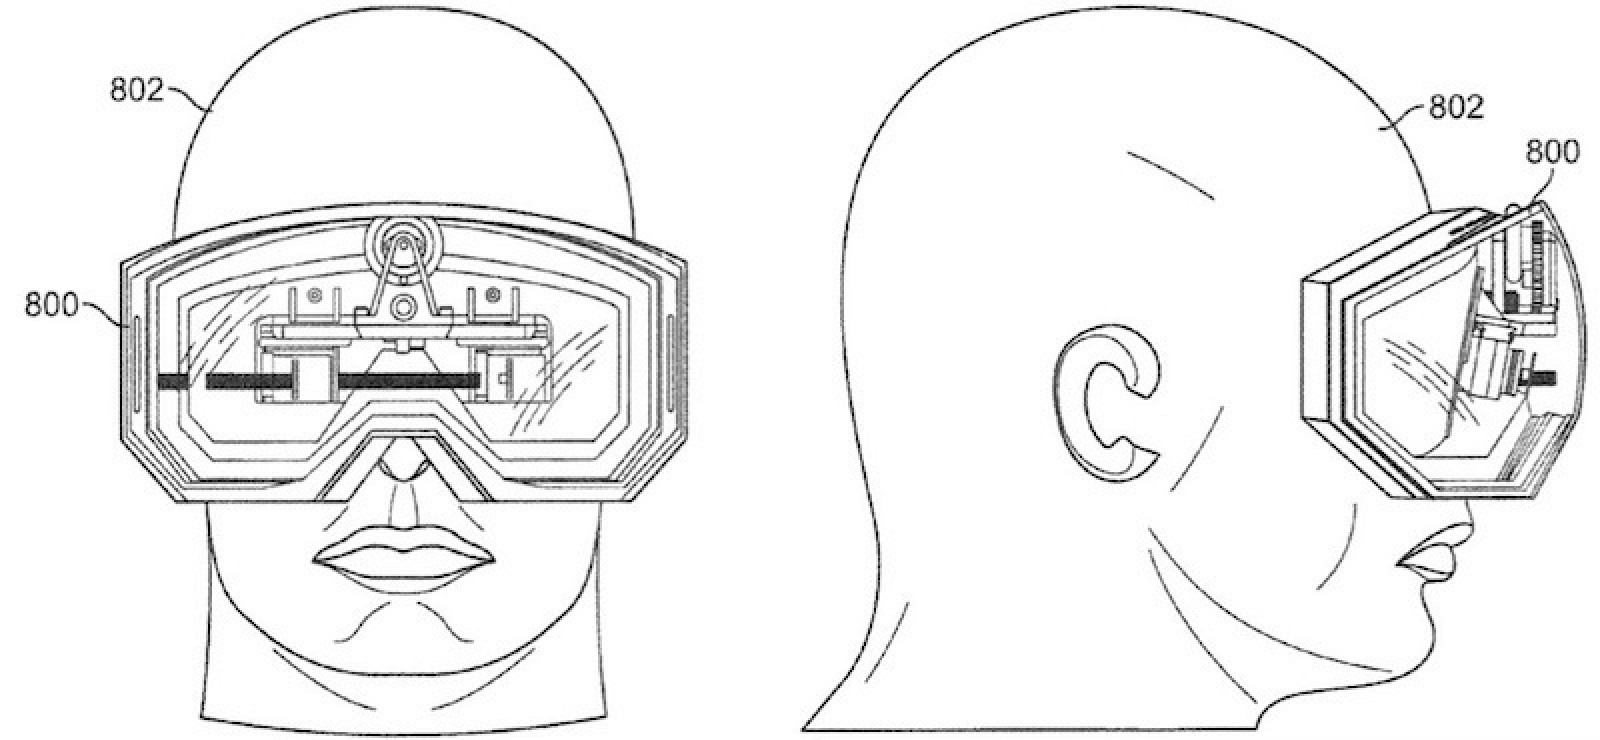 apple_patent_video_goggle.jpg